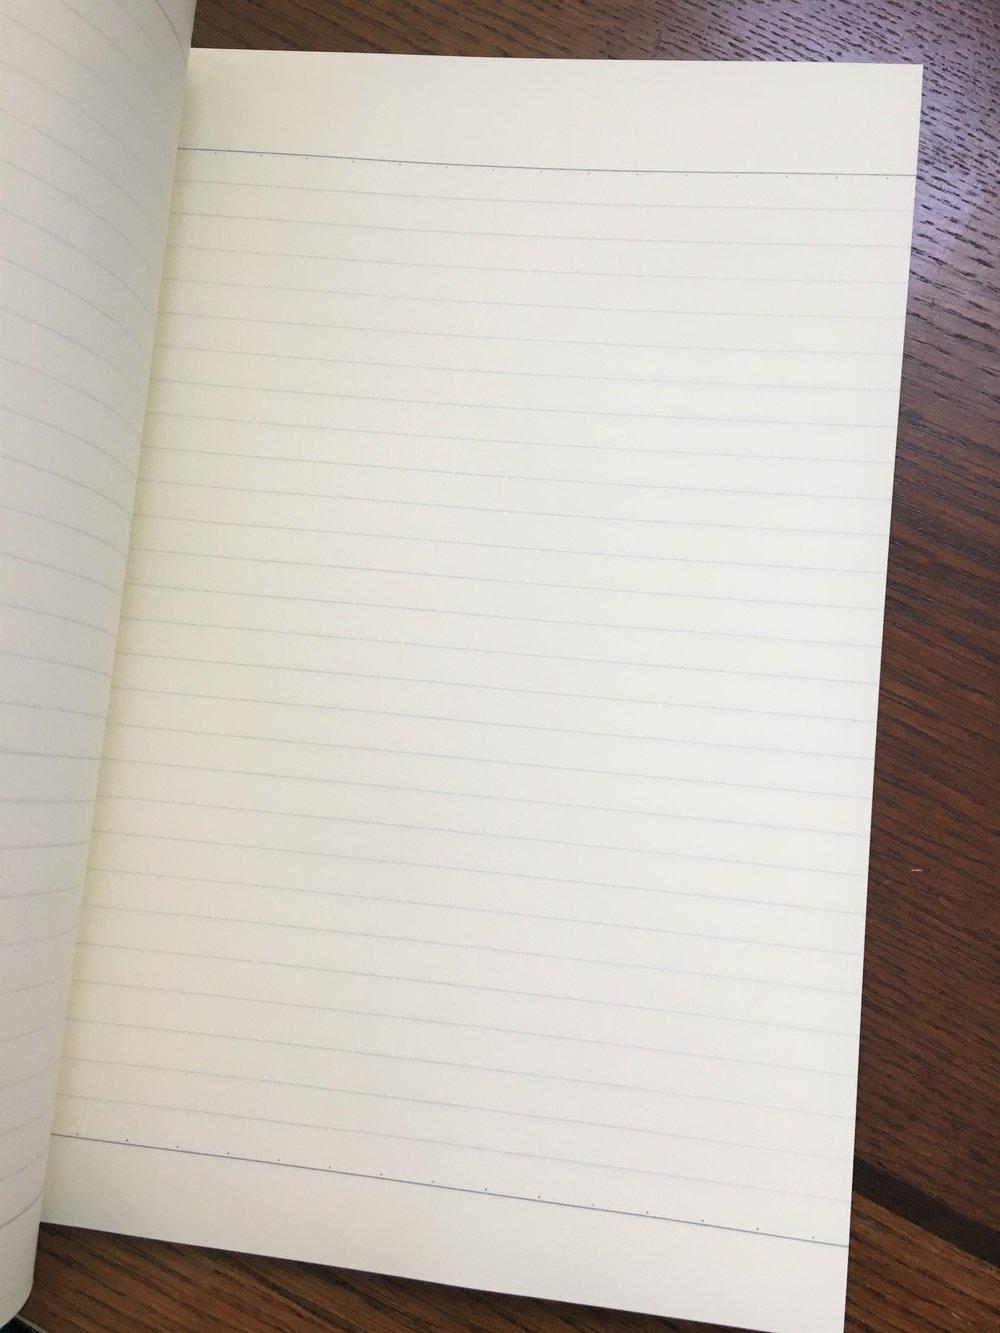 Tsubame Fools Cream B5 Notebook